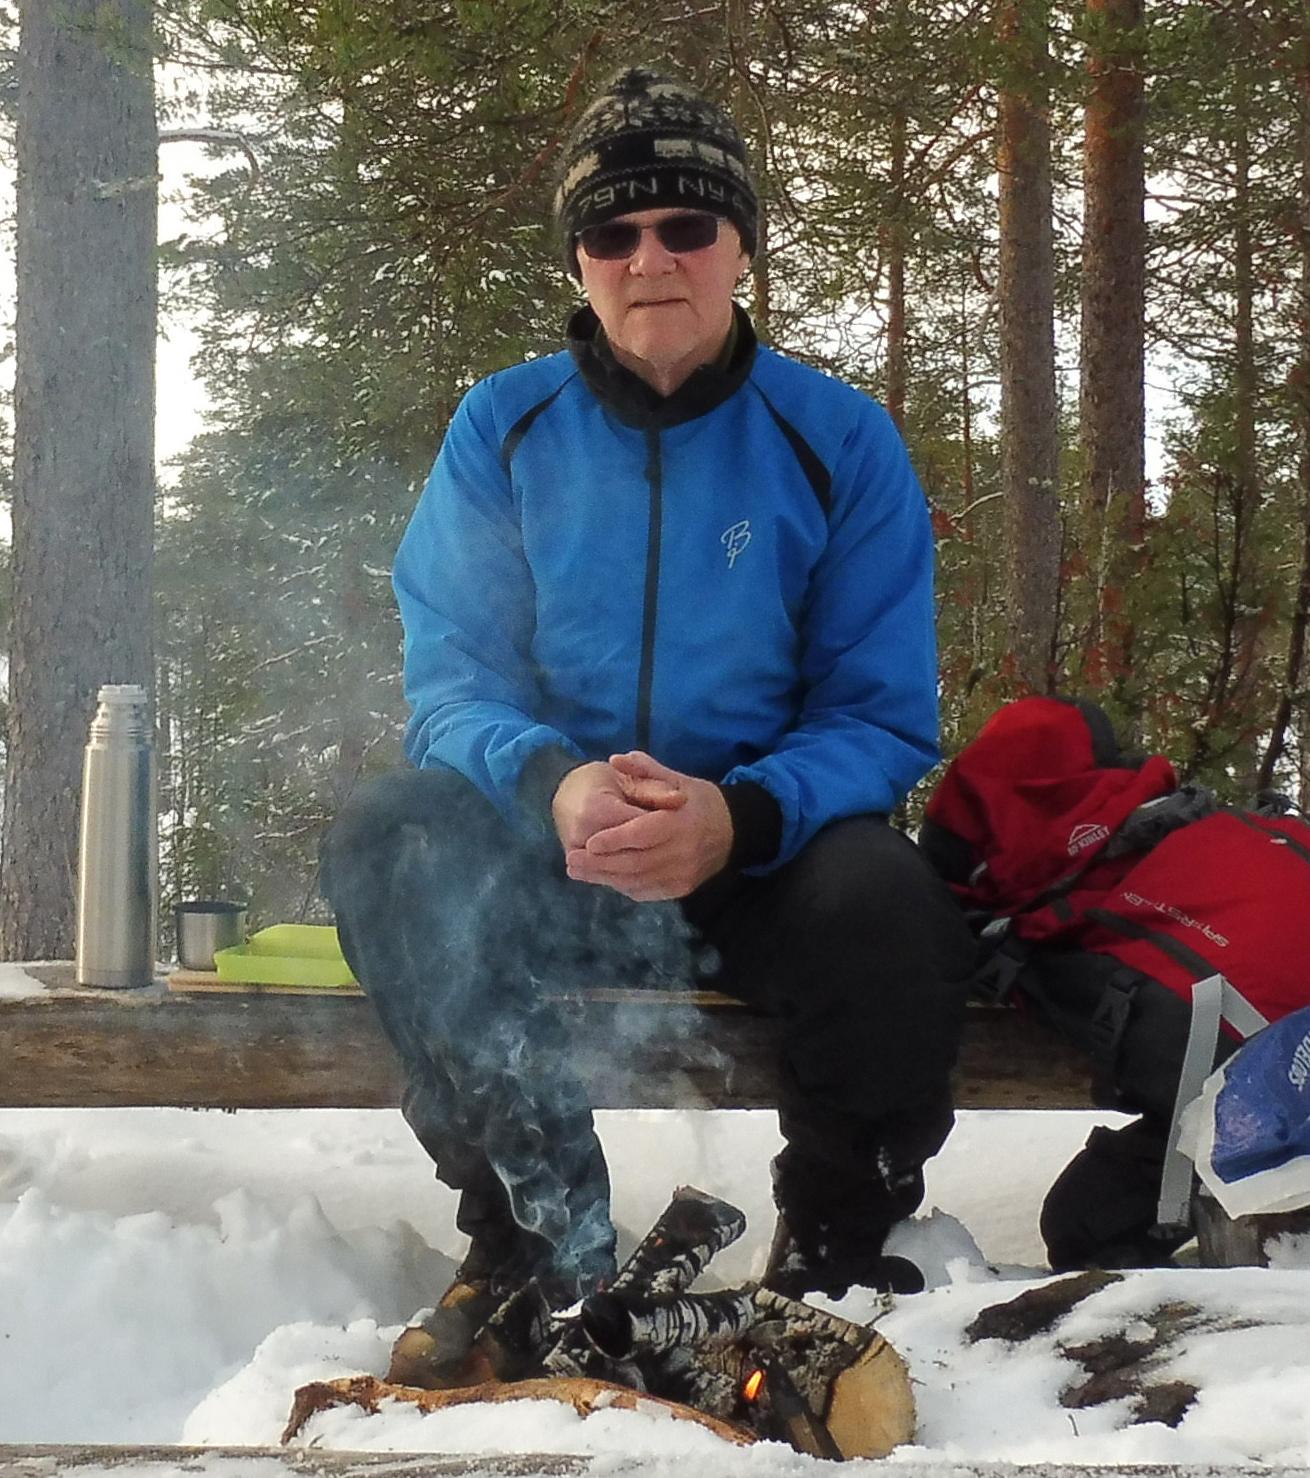 Mæ sjøl på fjellet vinteren 2019